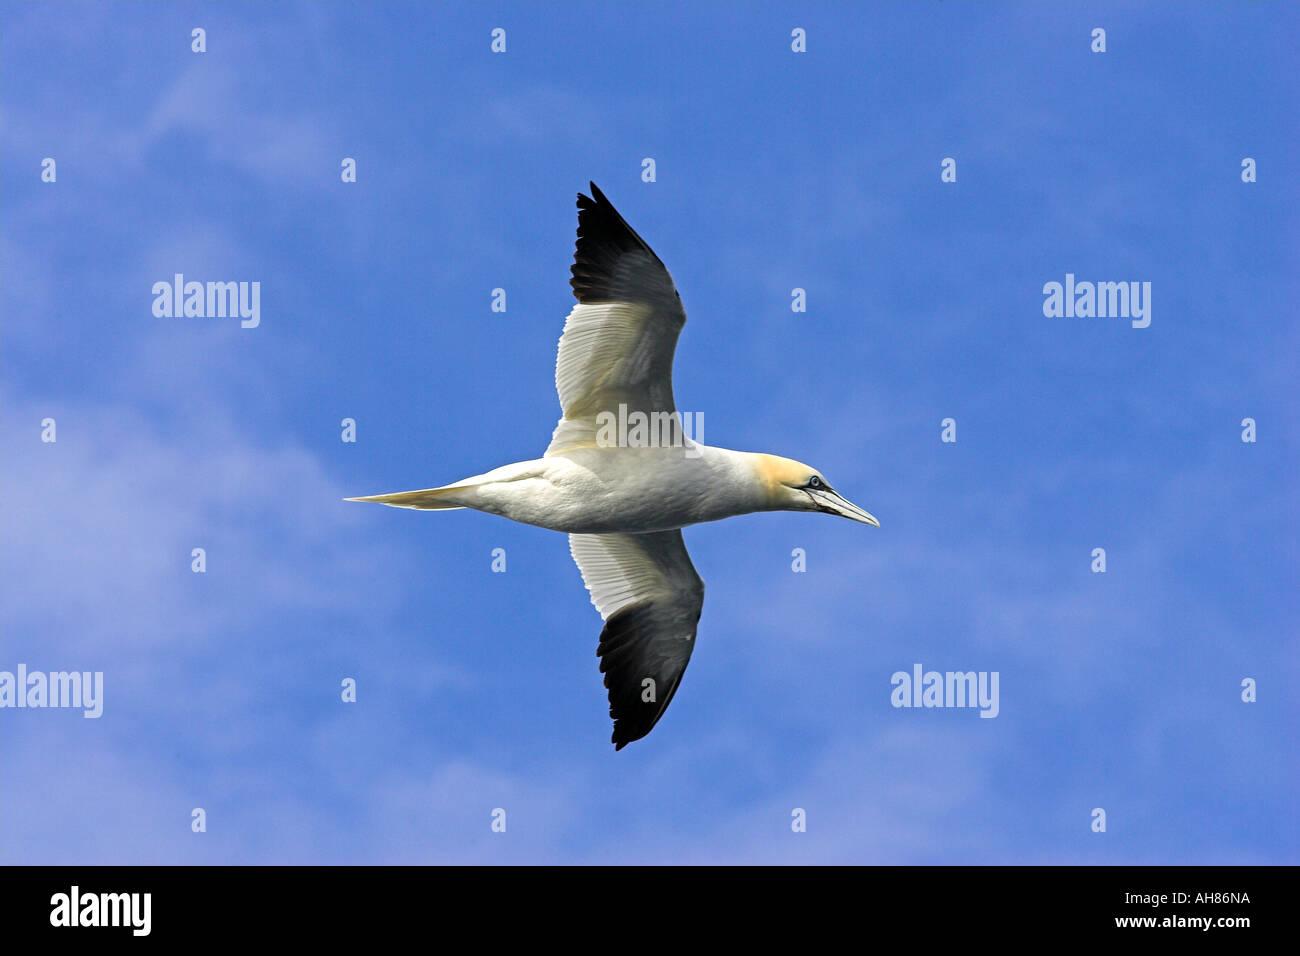 gannet in flight - Stock Image